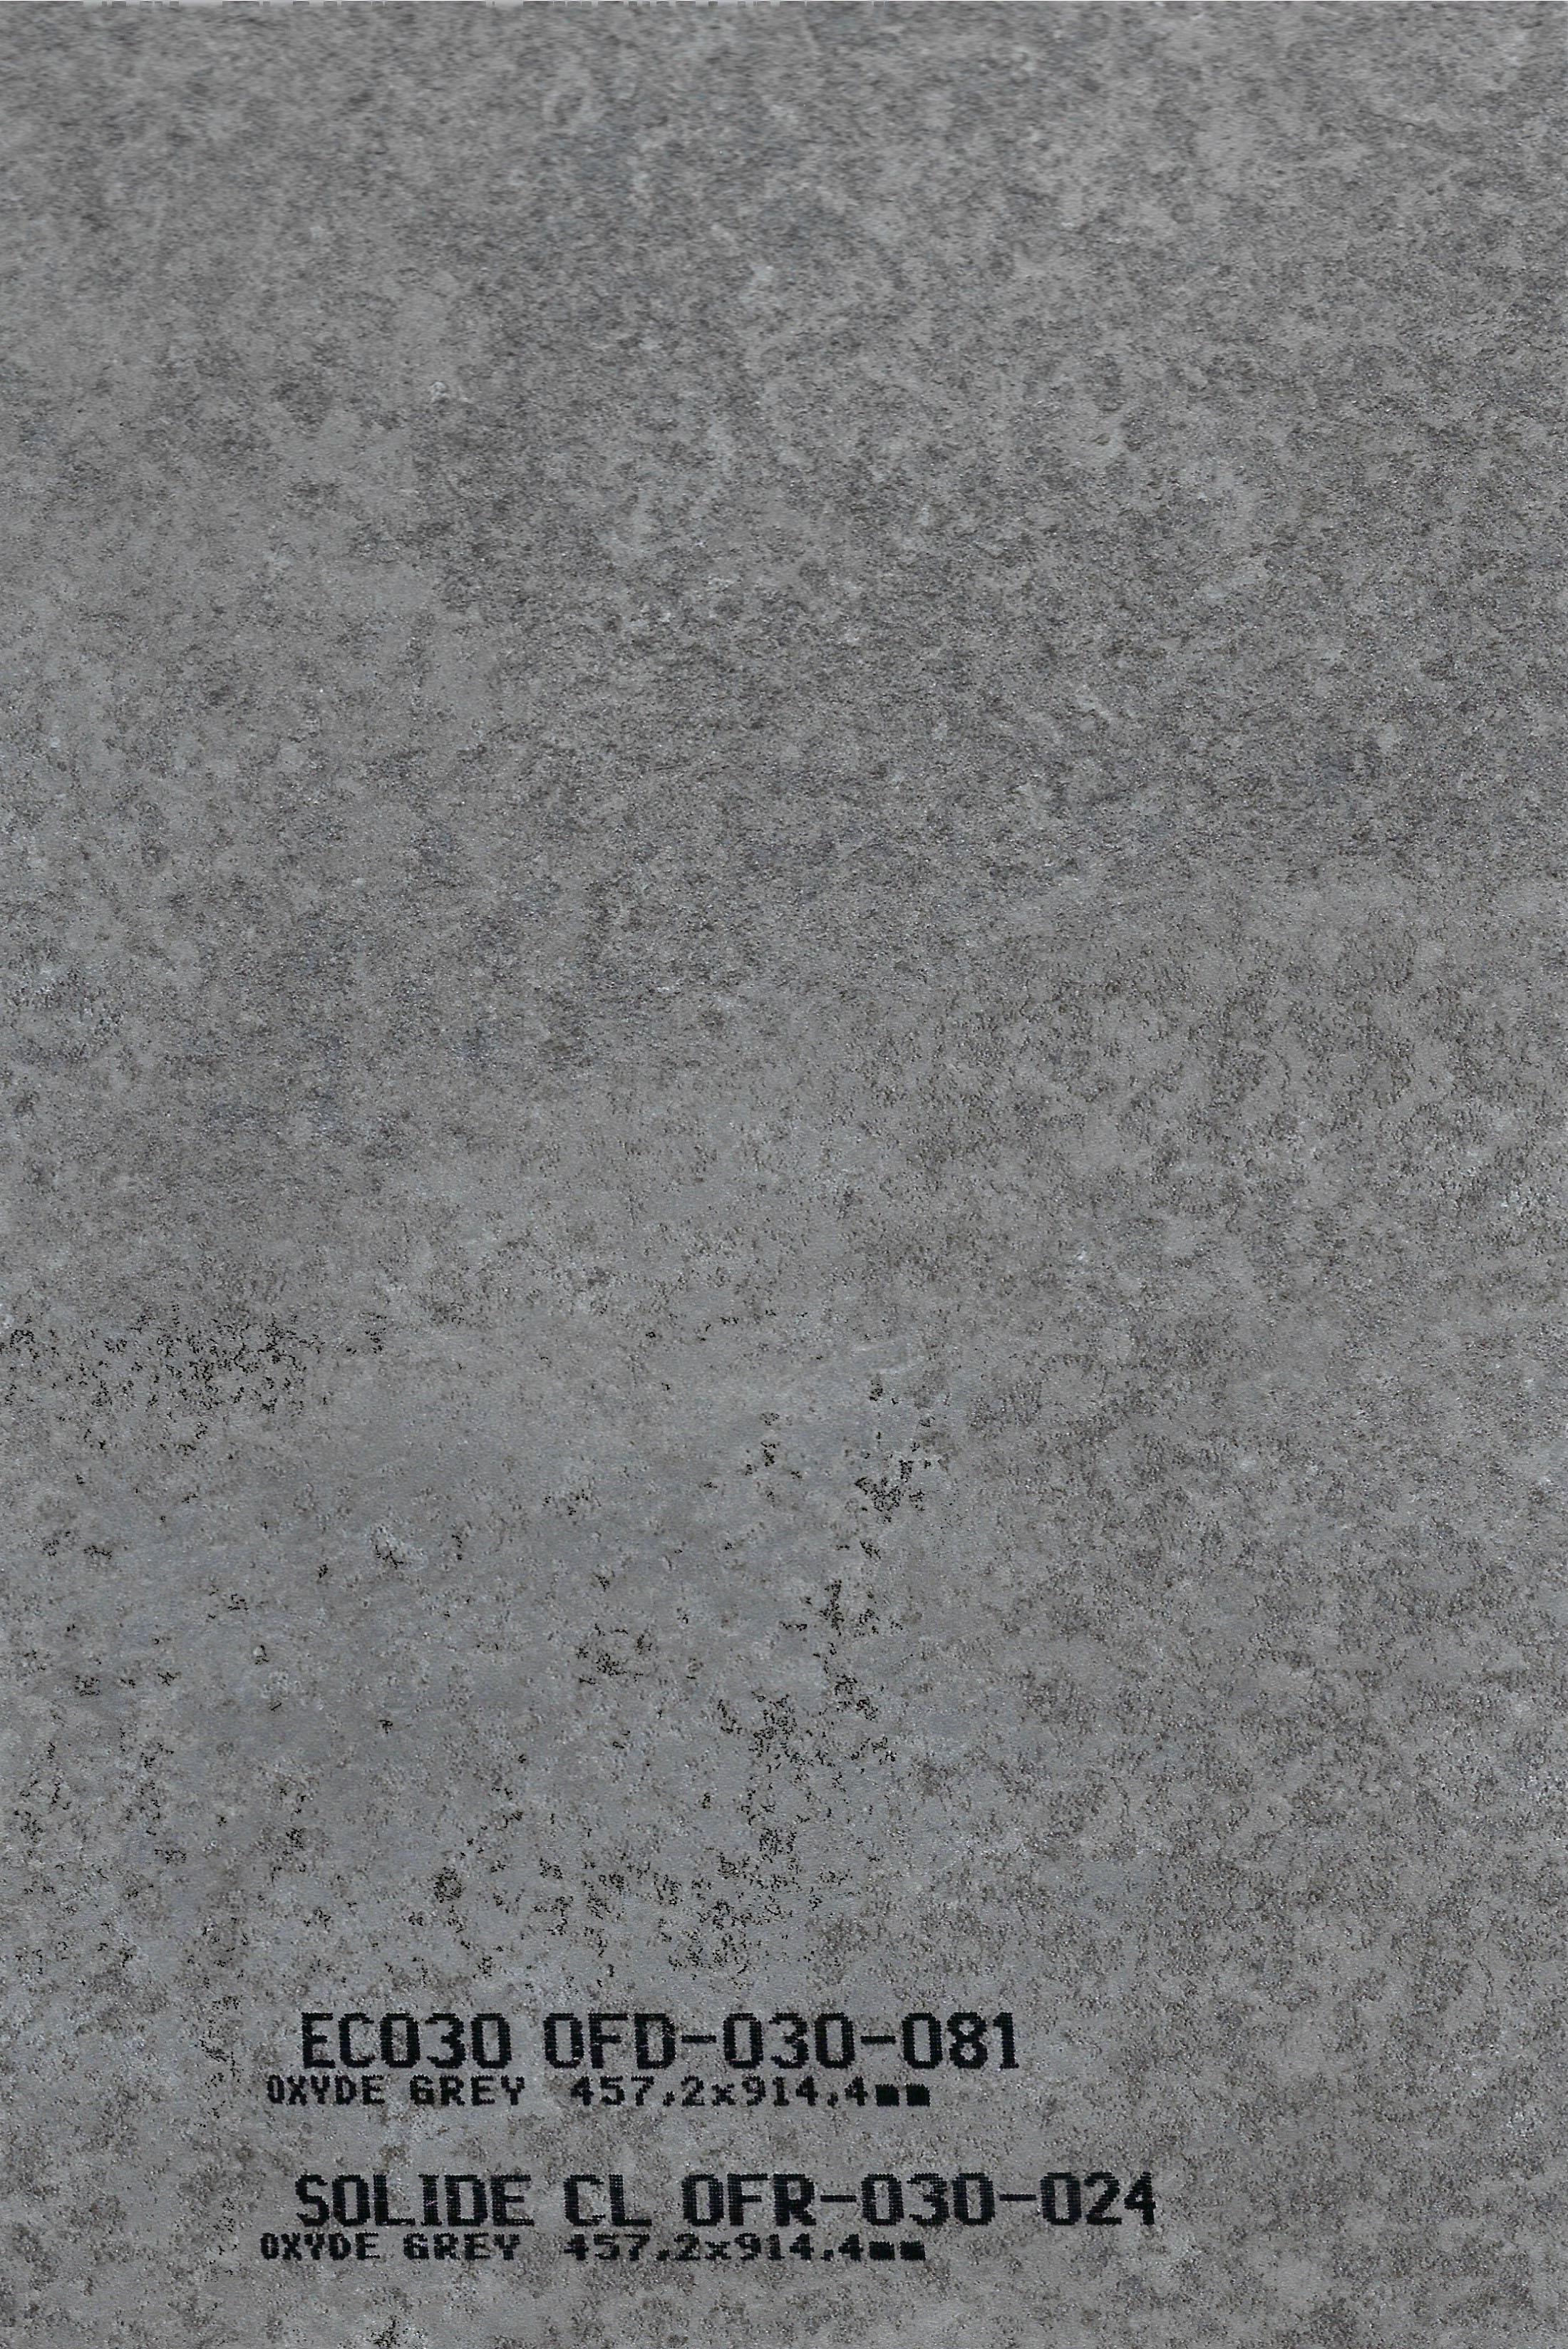 VINYL SOLIDE CLICK 30 024 Oxyde Grey